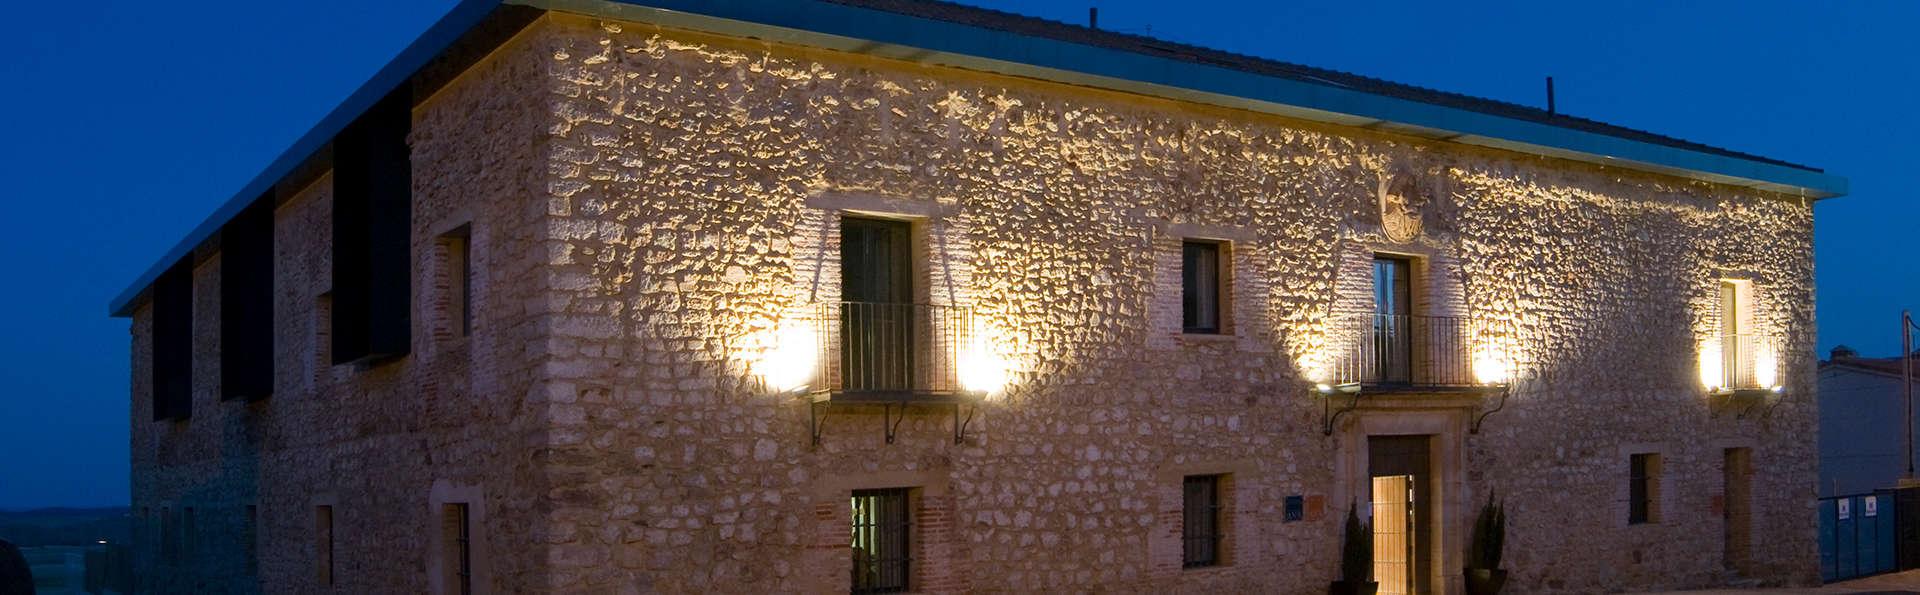 Hotel Convento Santa Ana - edit_front1.jpg